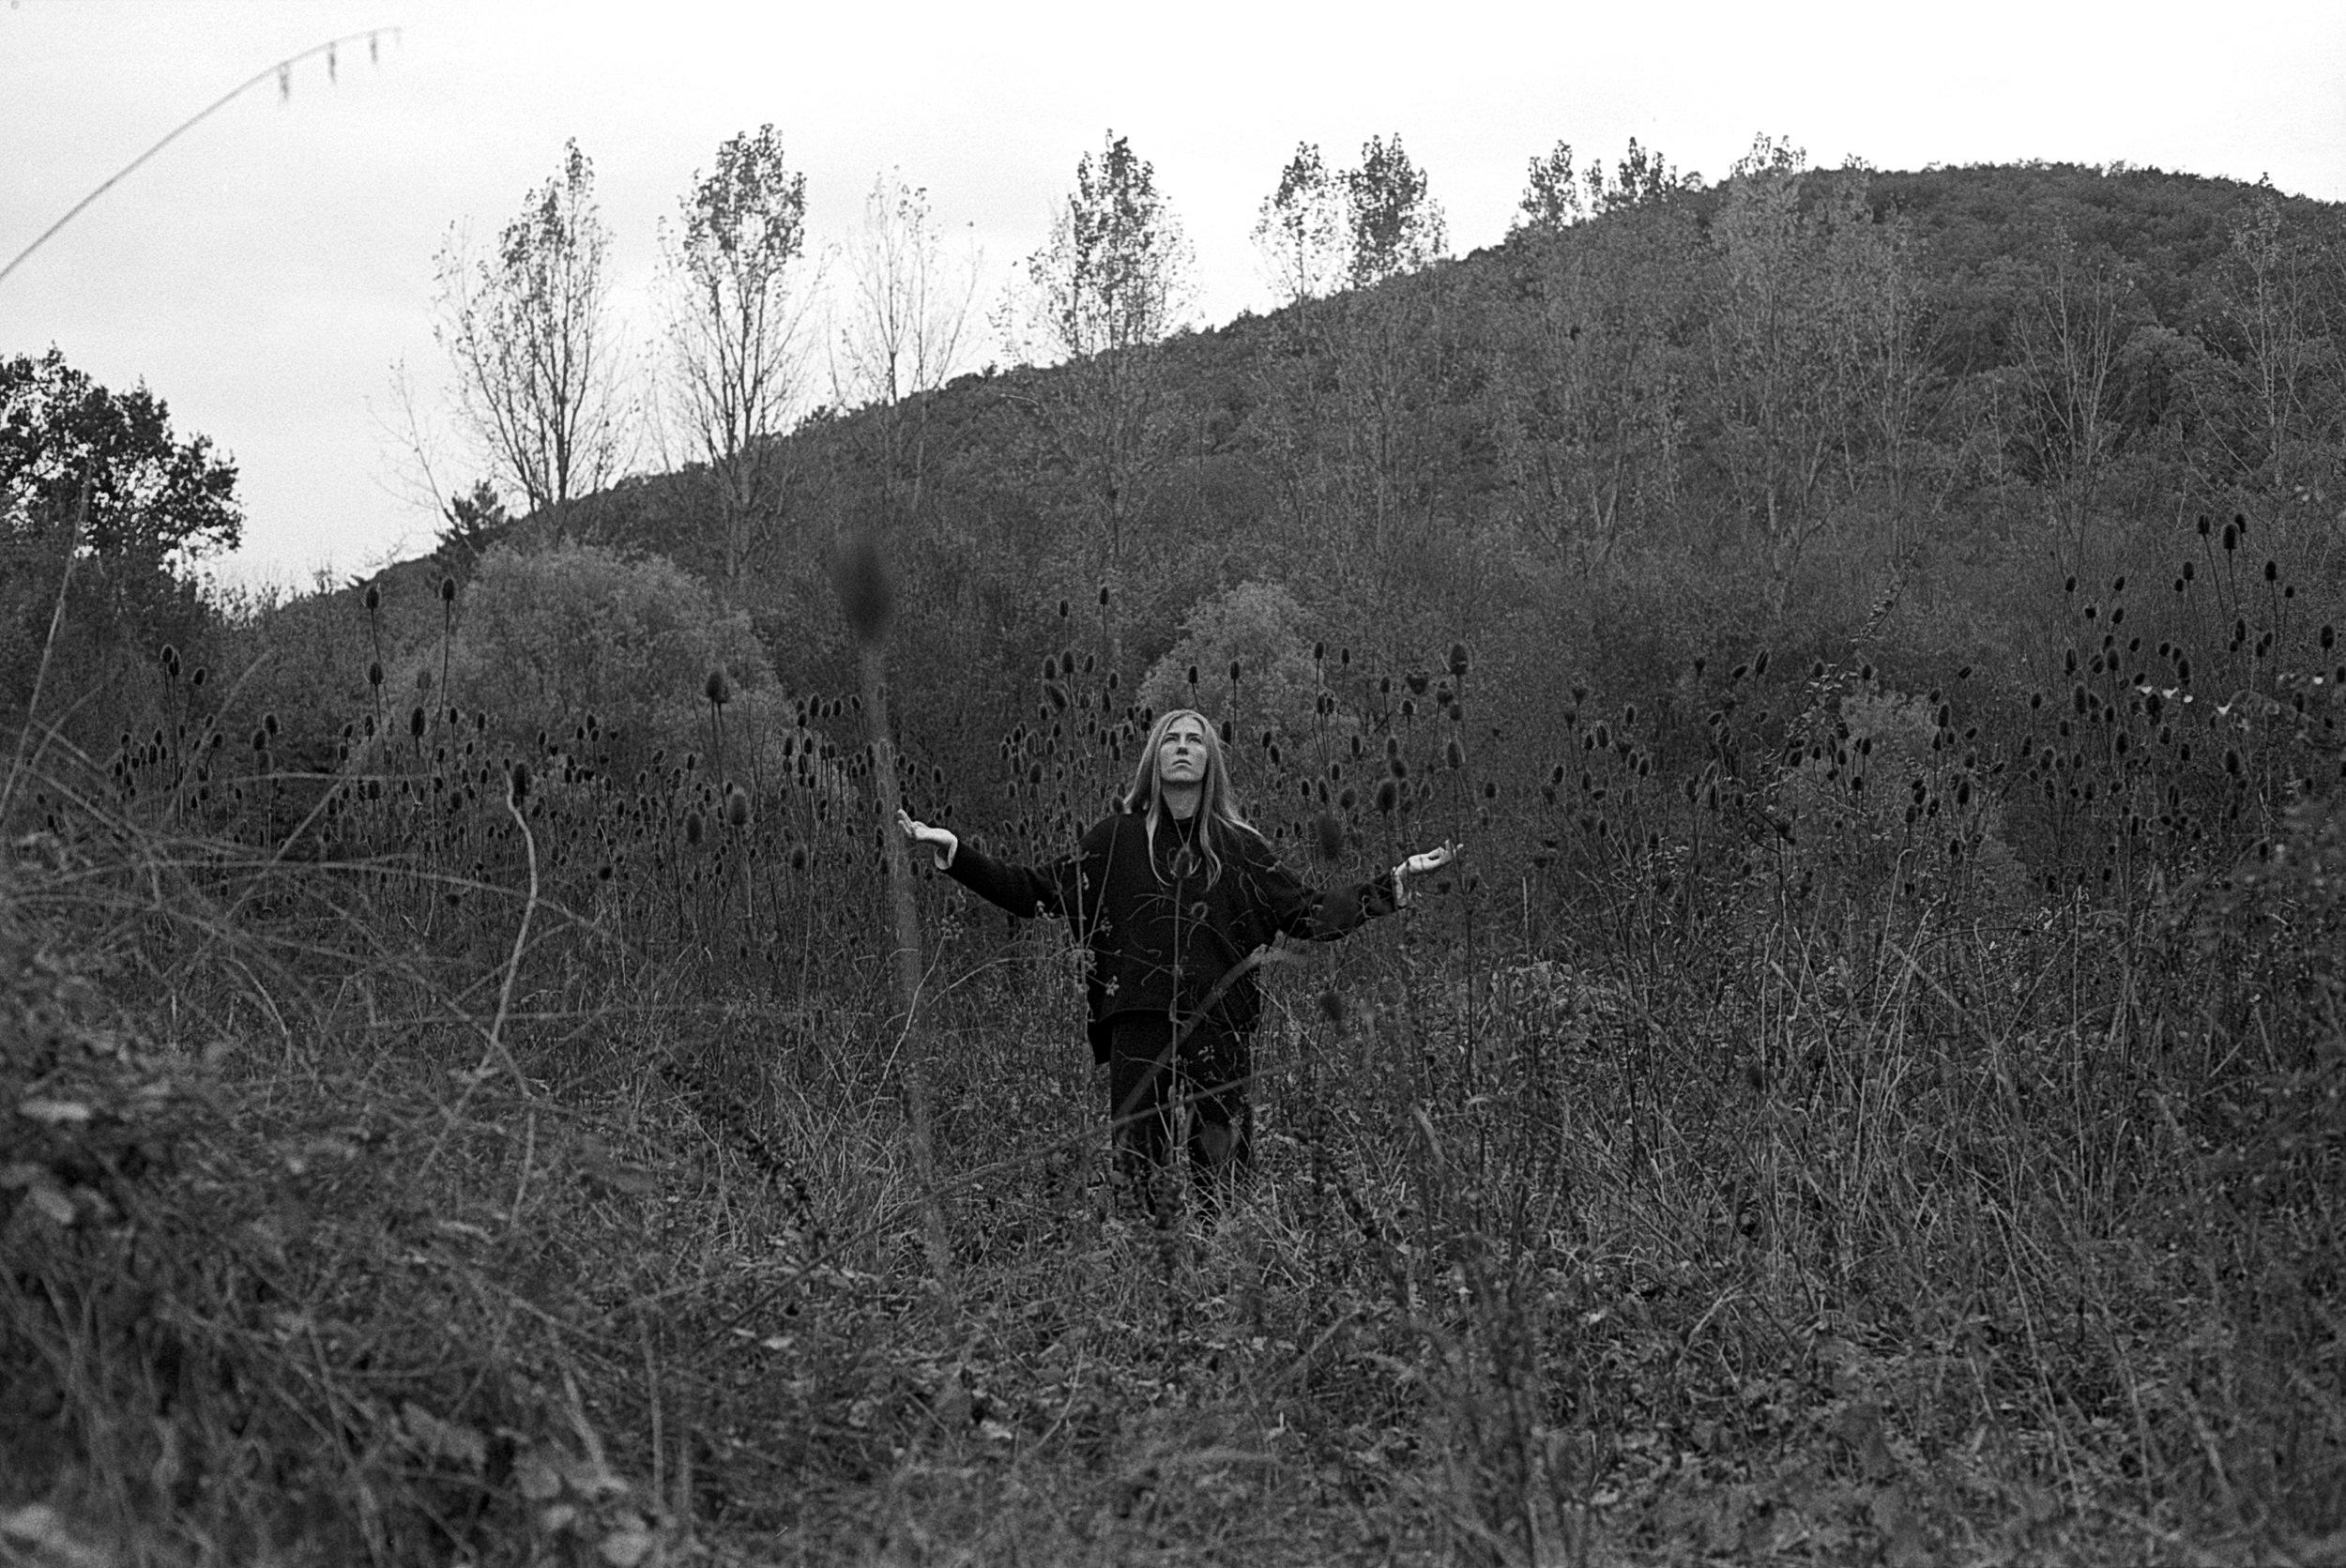 Samana, Samana Music, Samana Portrait,  black and white photography